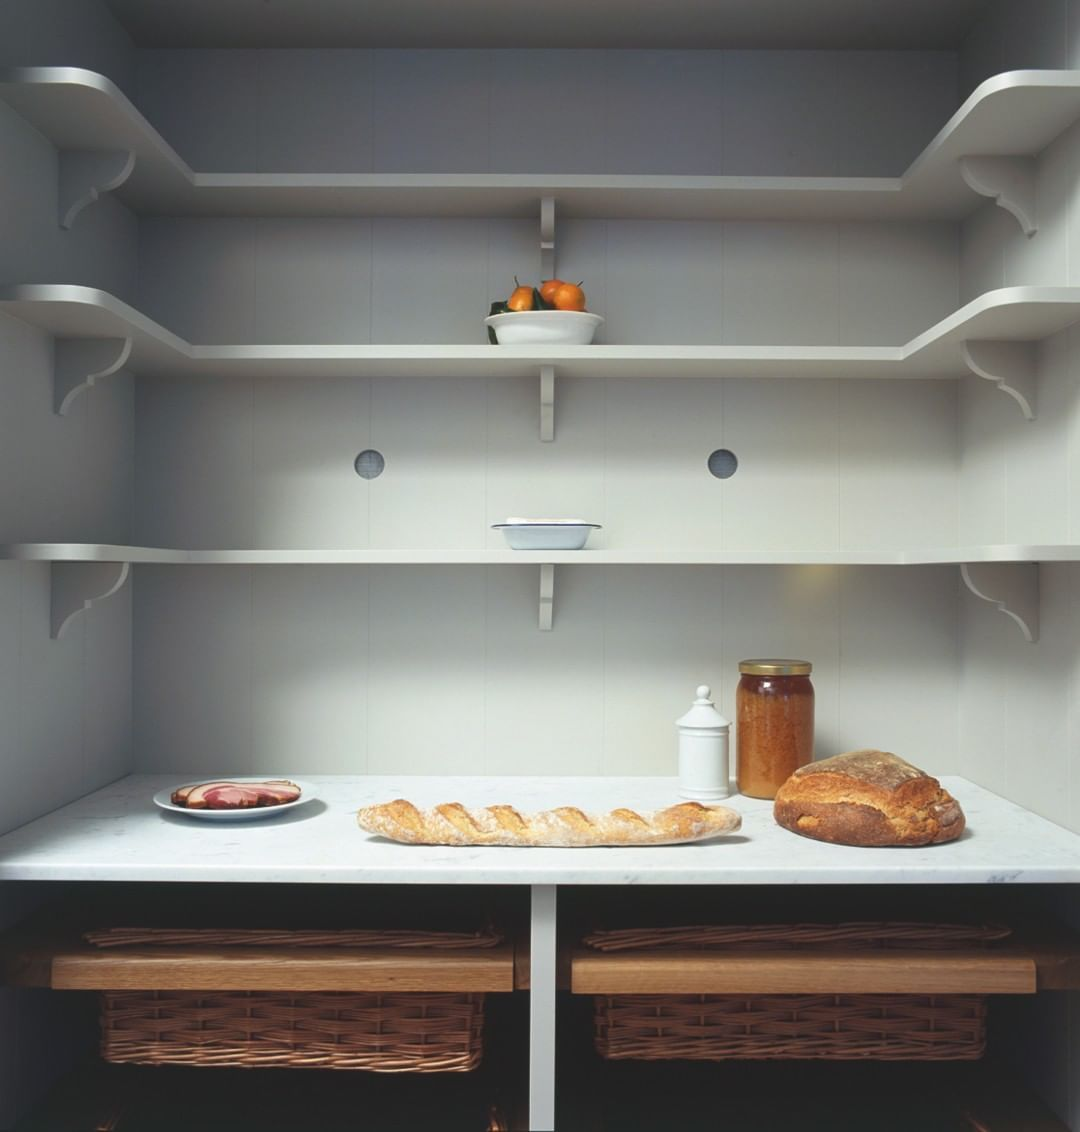 "Plain English Design on Instagram: ""We so enjoy the old fashioned simplicity of our Plain English larder cupboard. So very pleasing! #lardercupboard #kitchendesign…"""